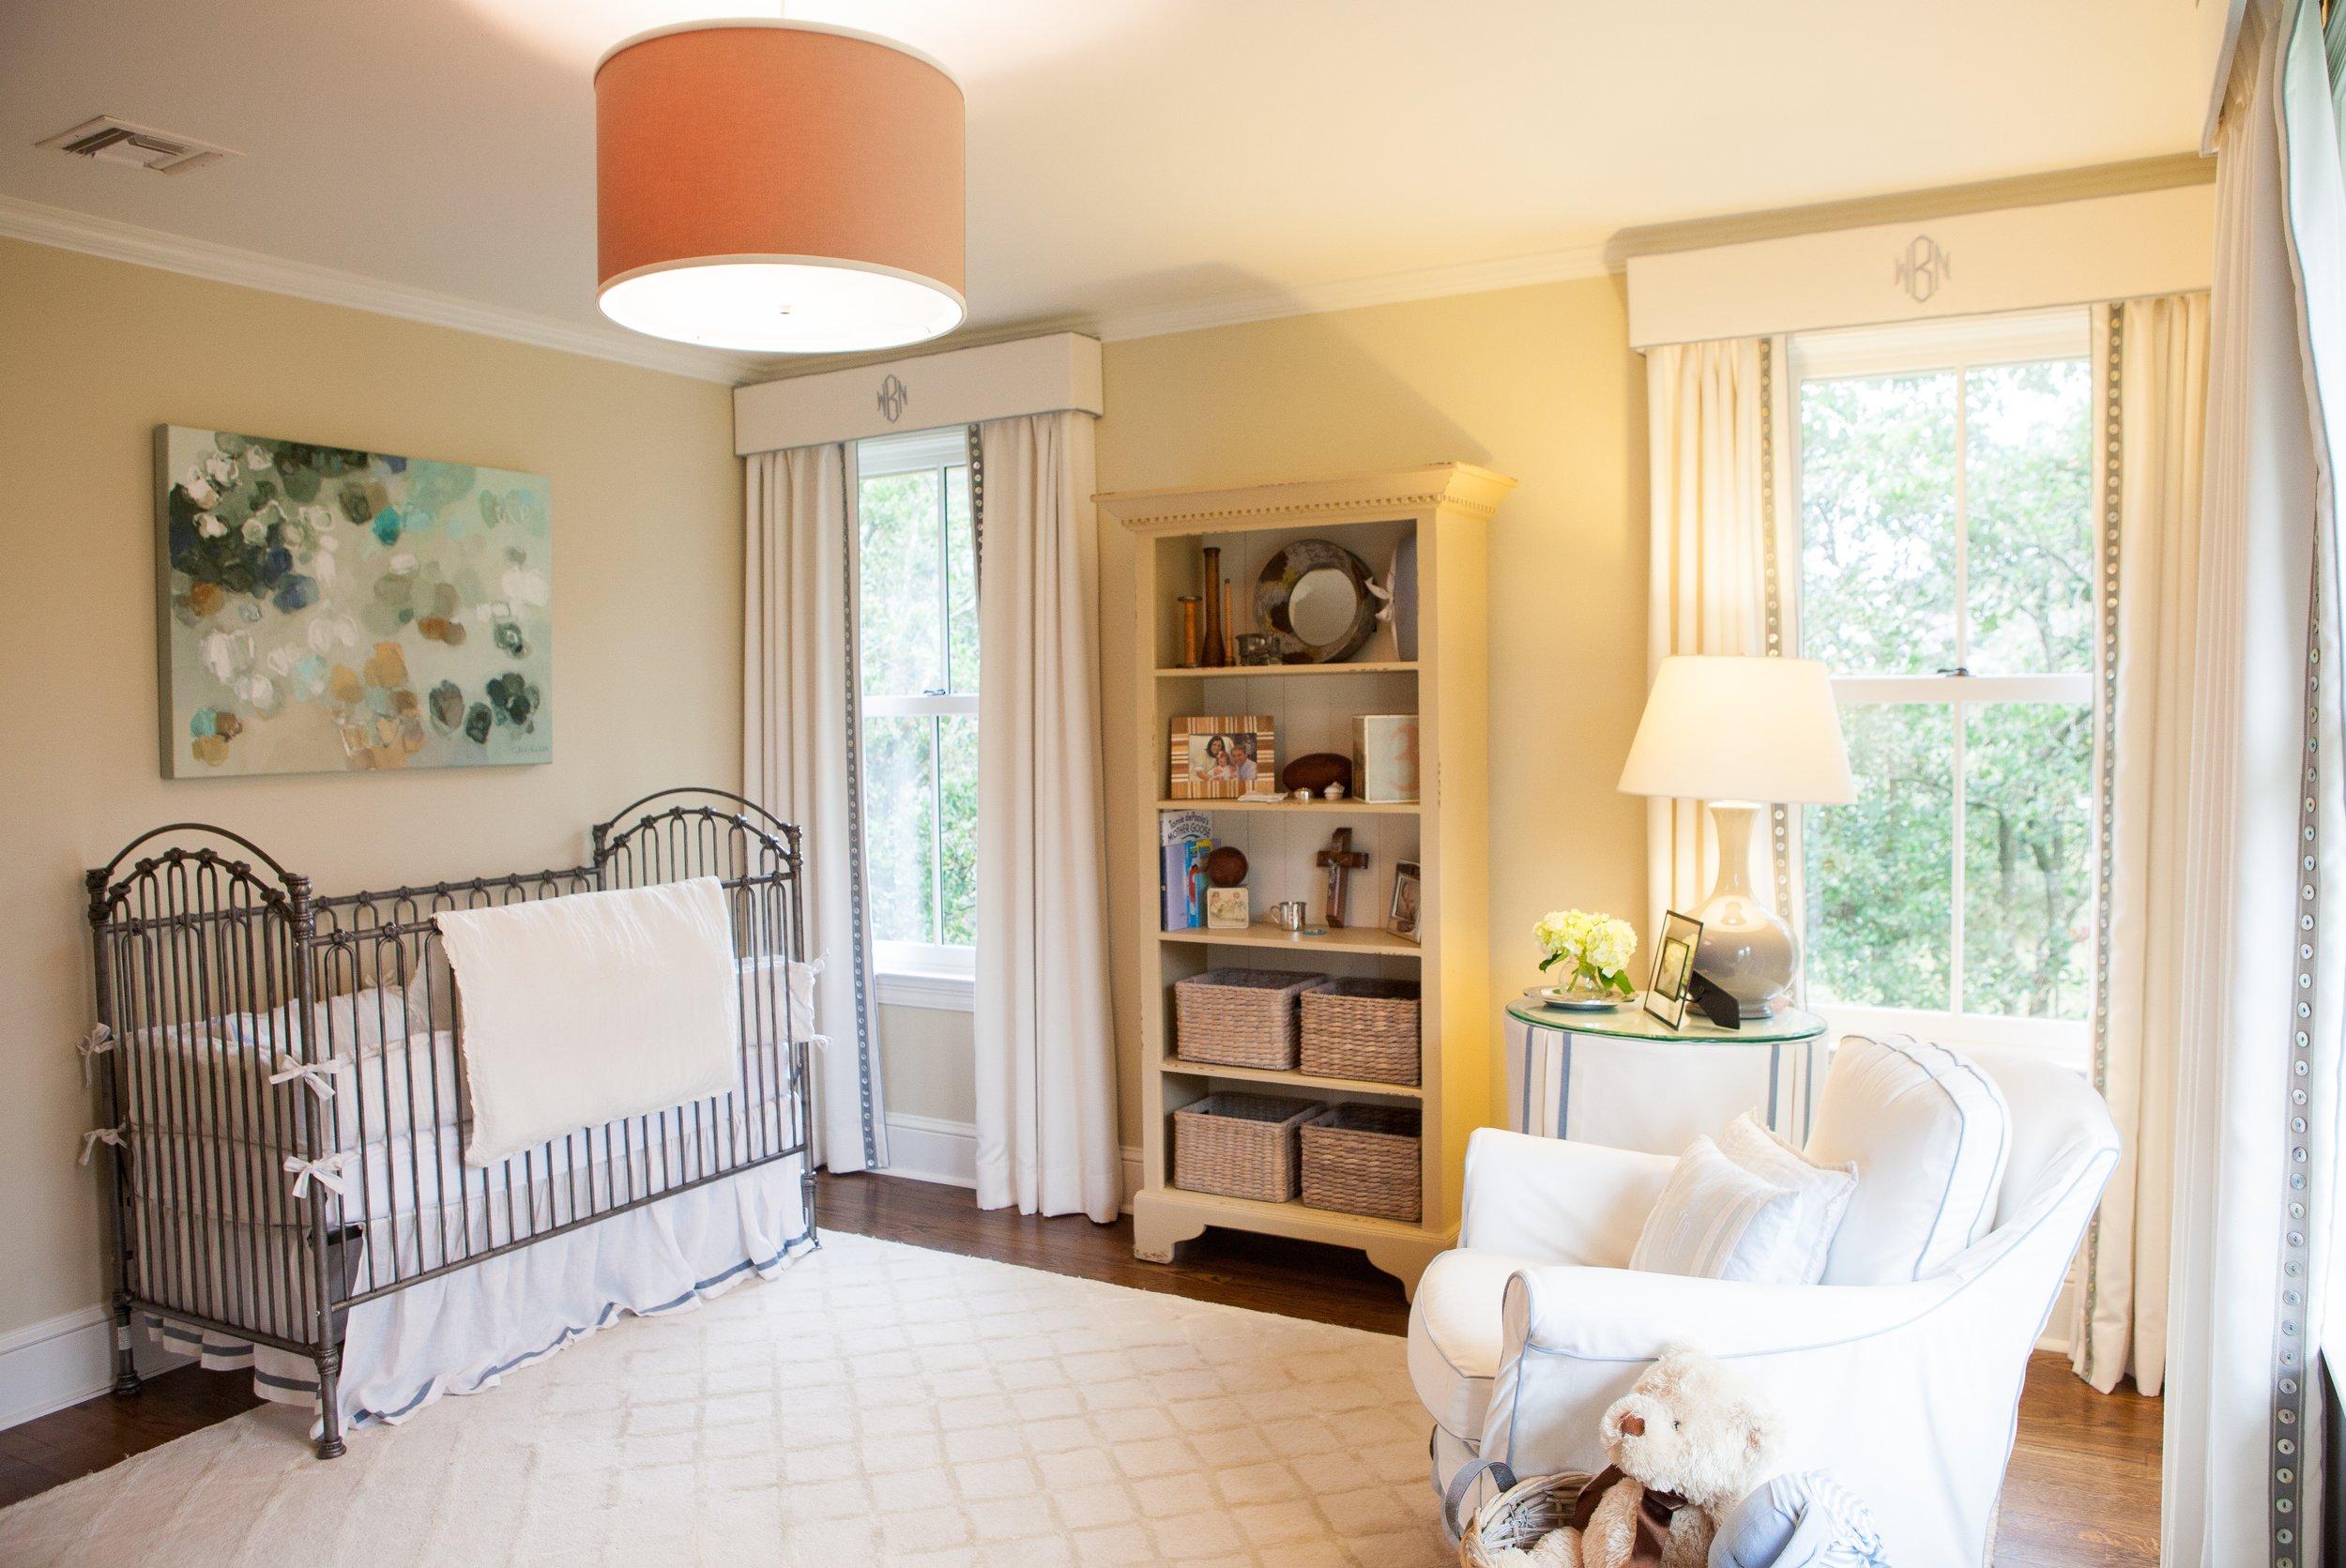 nursery design with iron crib and custom curtains